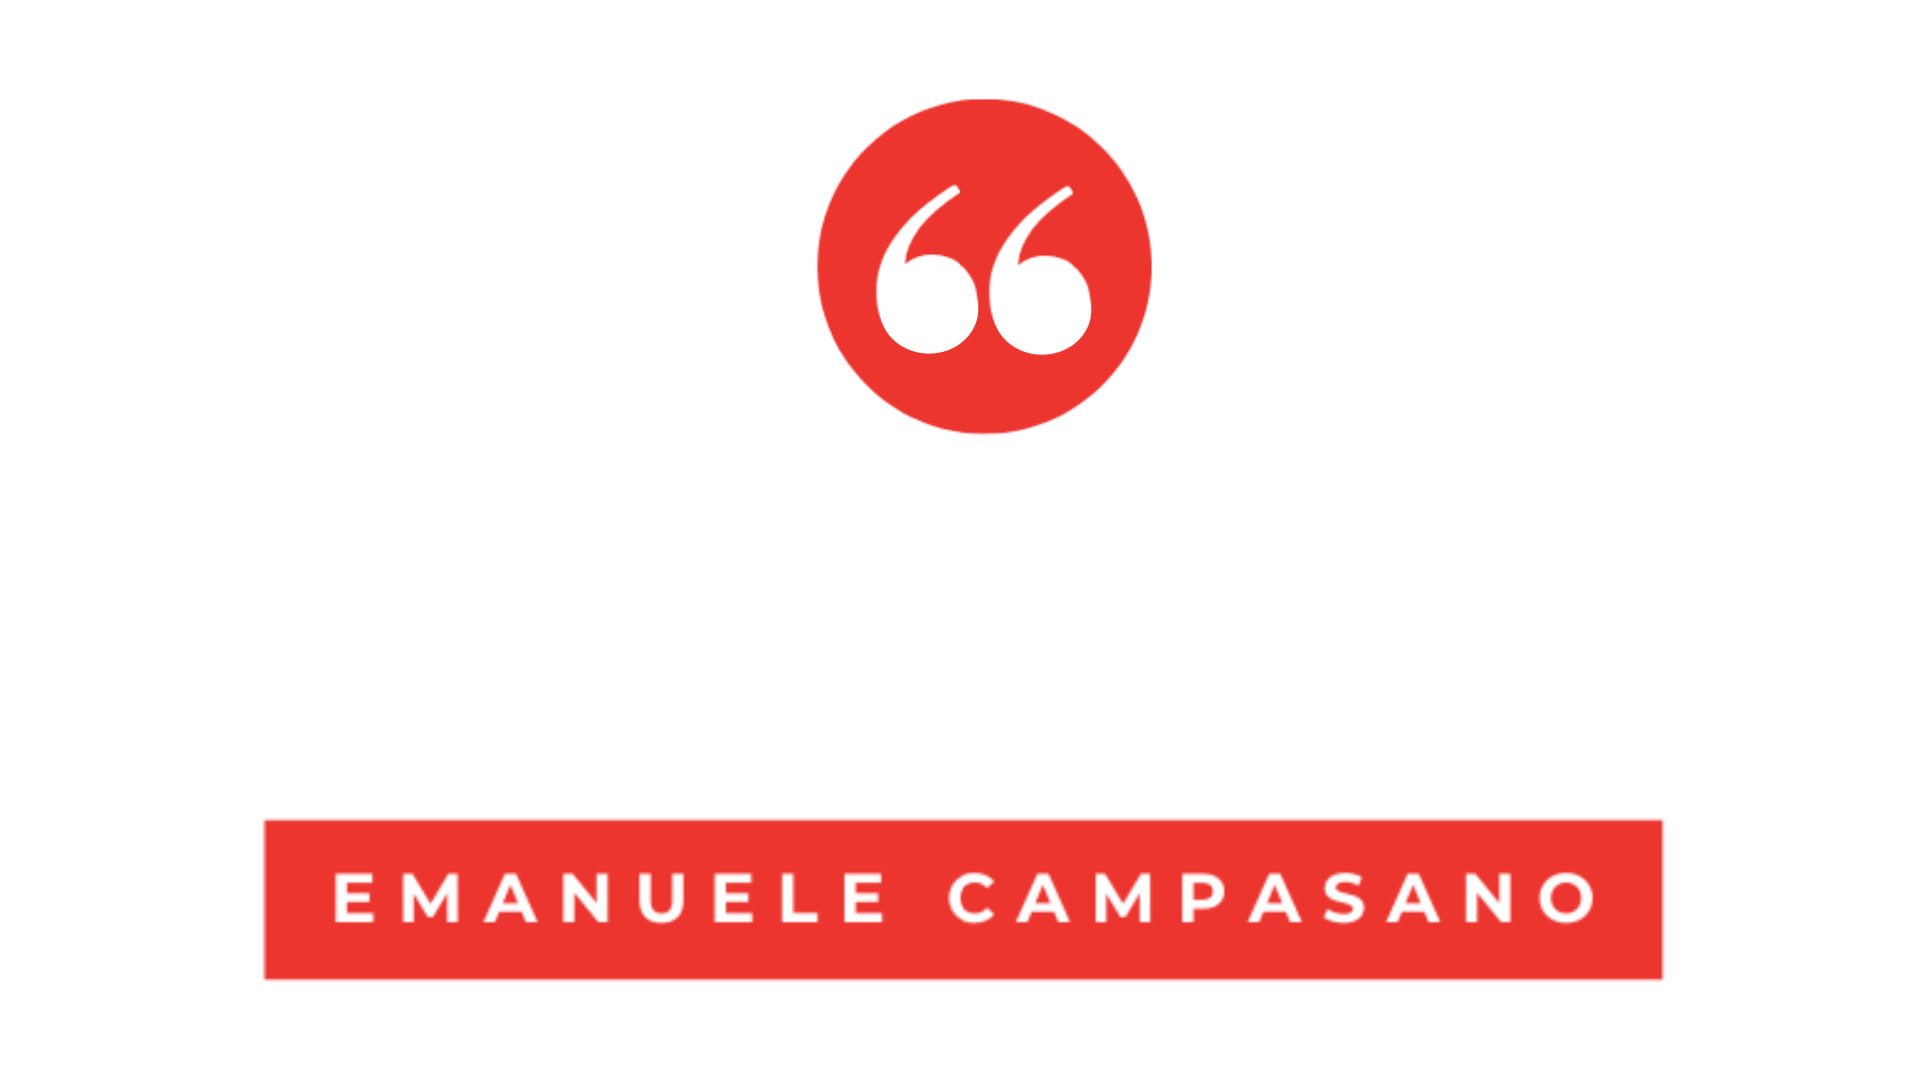 Emanuele Campasano